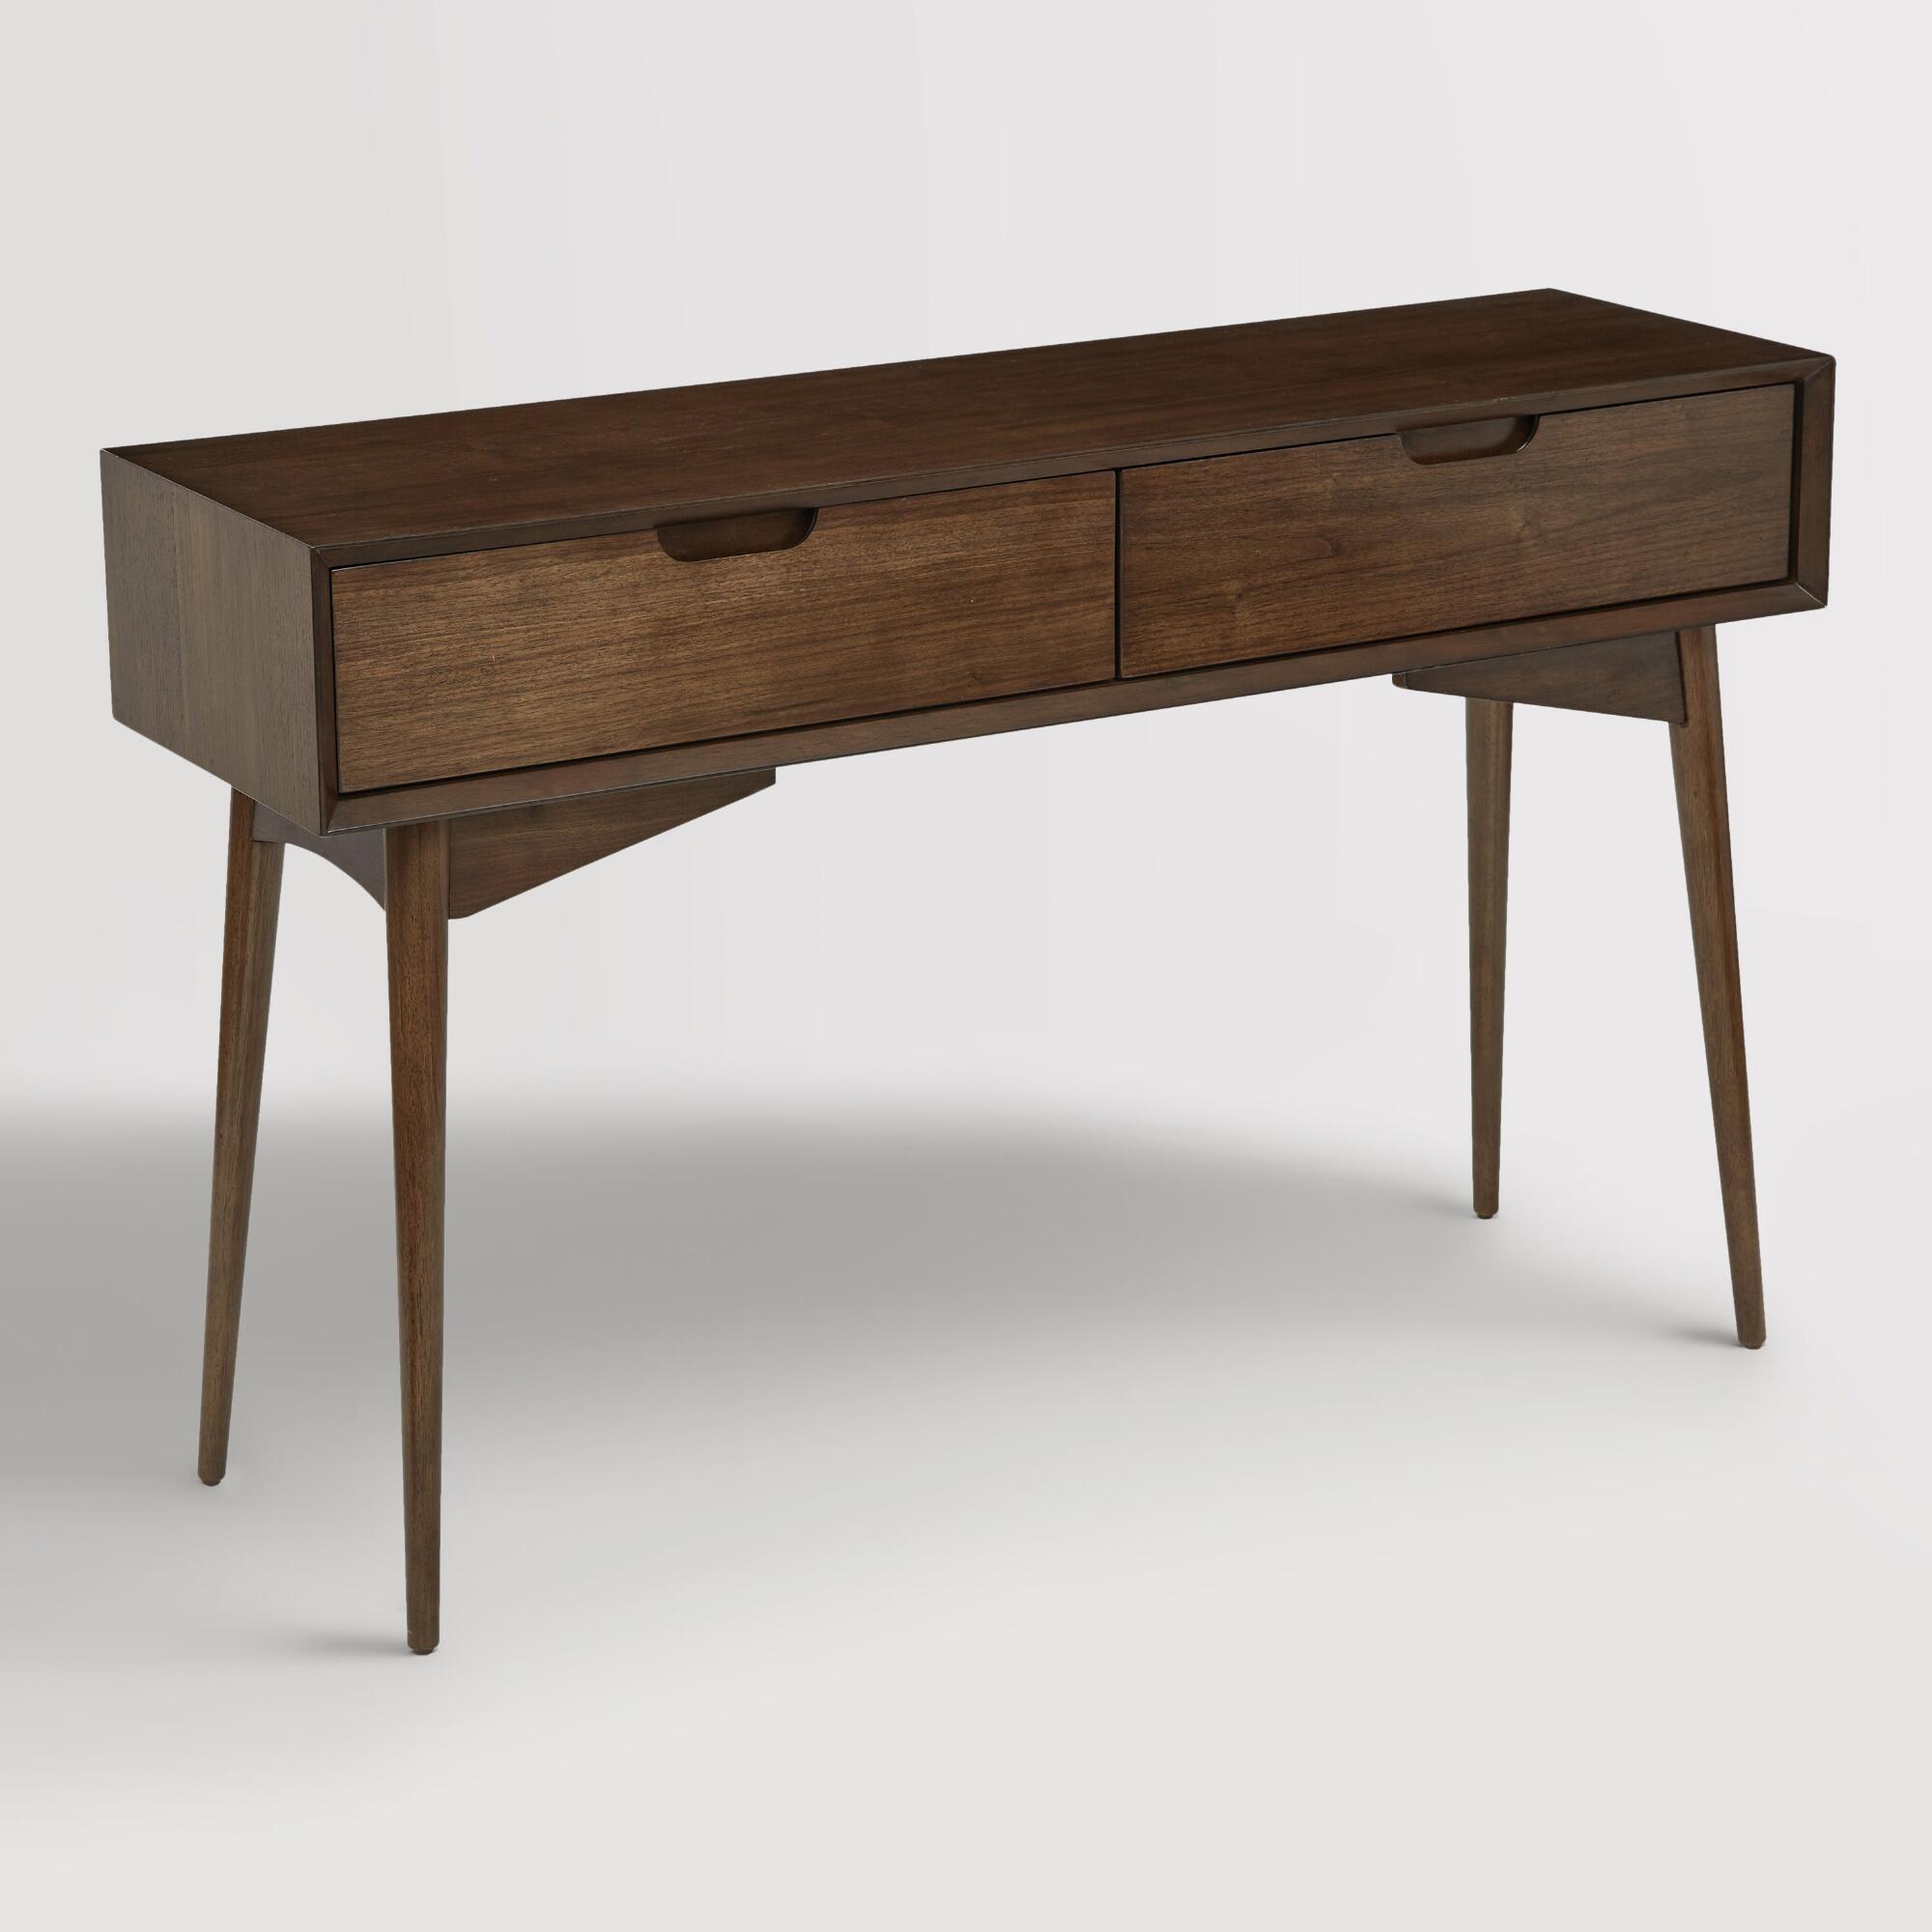 Walnut Brown Wood Brewston Coffee Table: Grottepastenaecollepardo